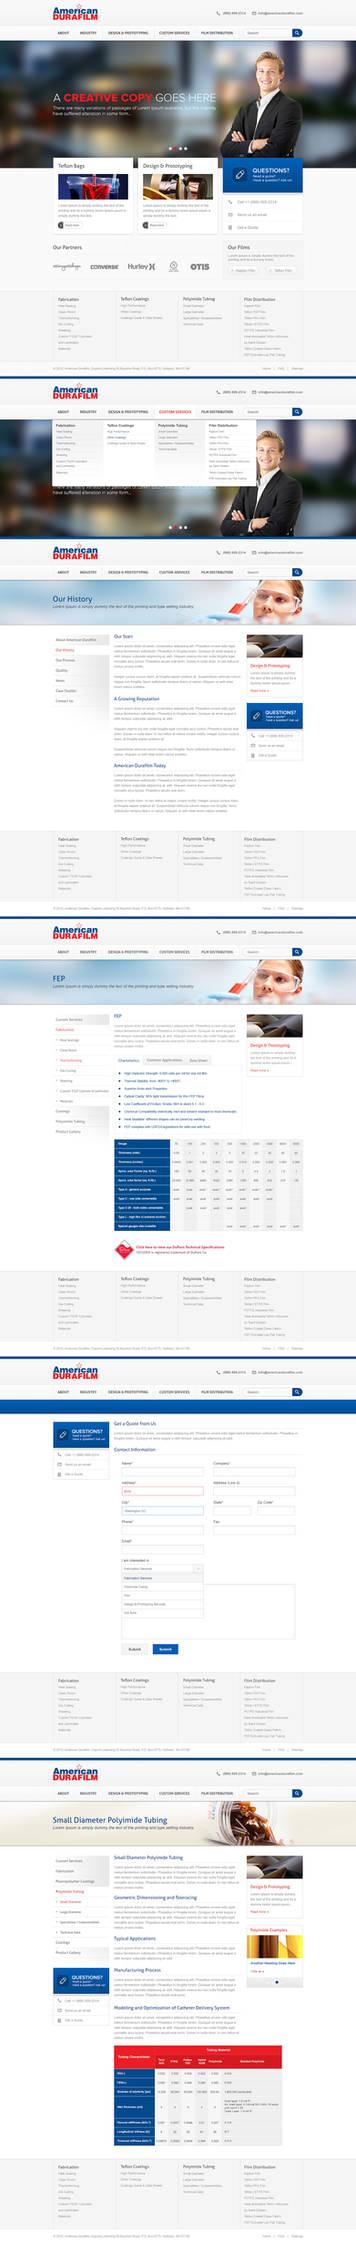 AD - Website Design by waseemarshad